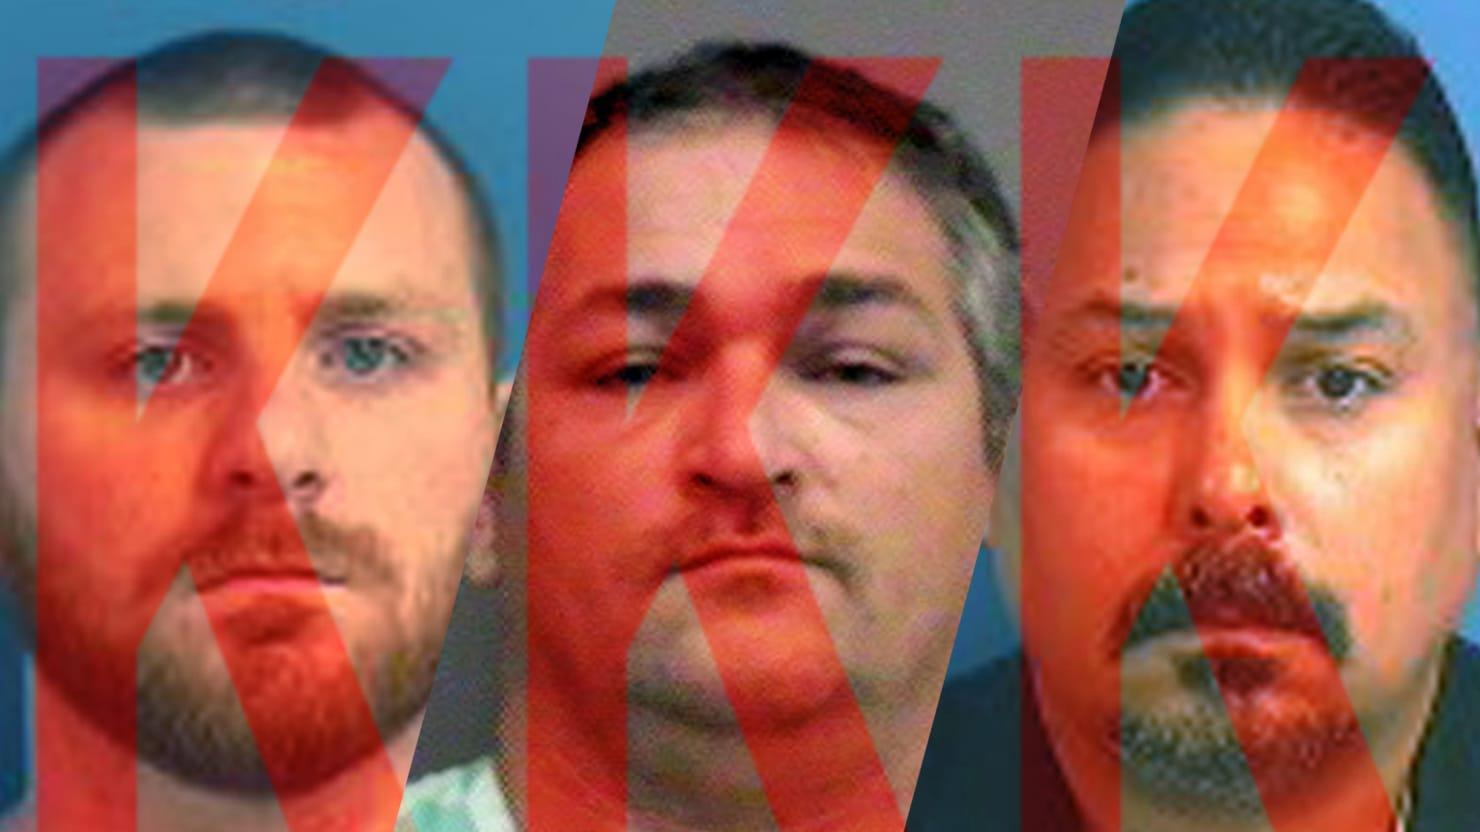 Florida Jailhouse Guards Arrested in KKK Murder Plot